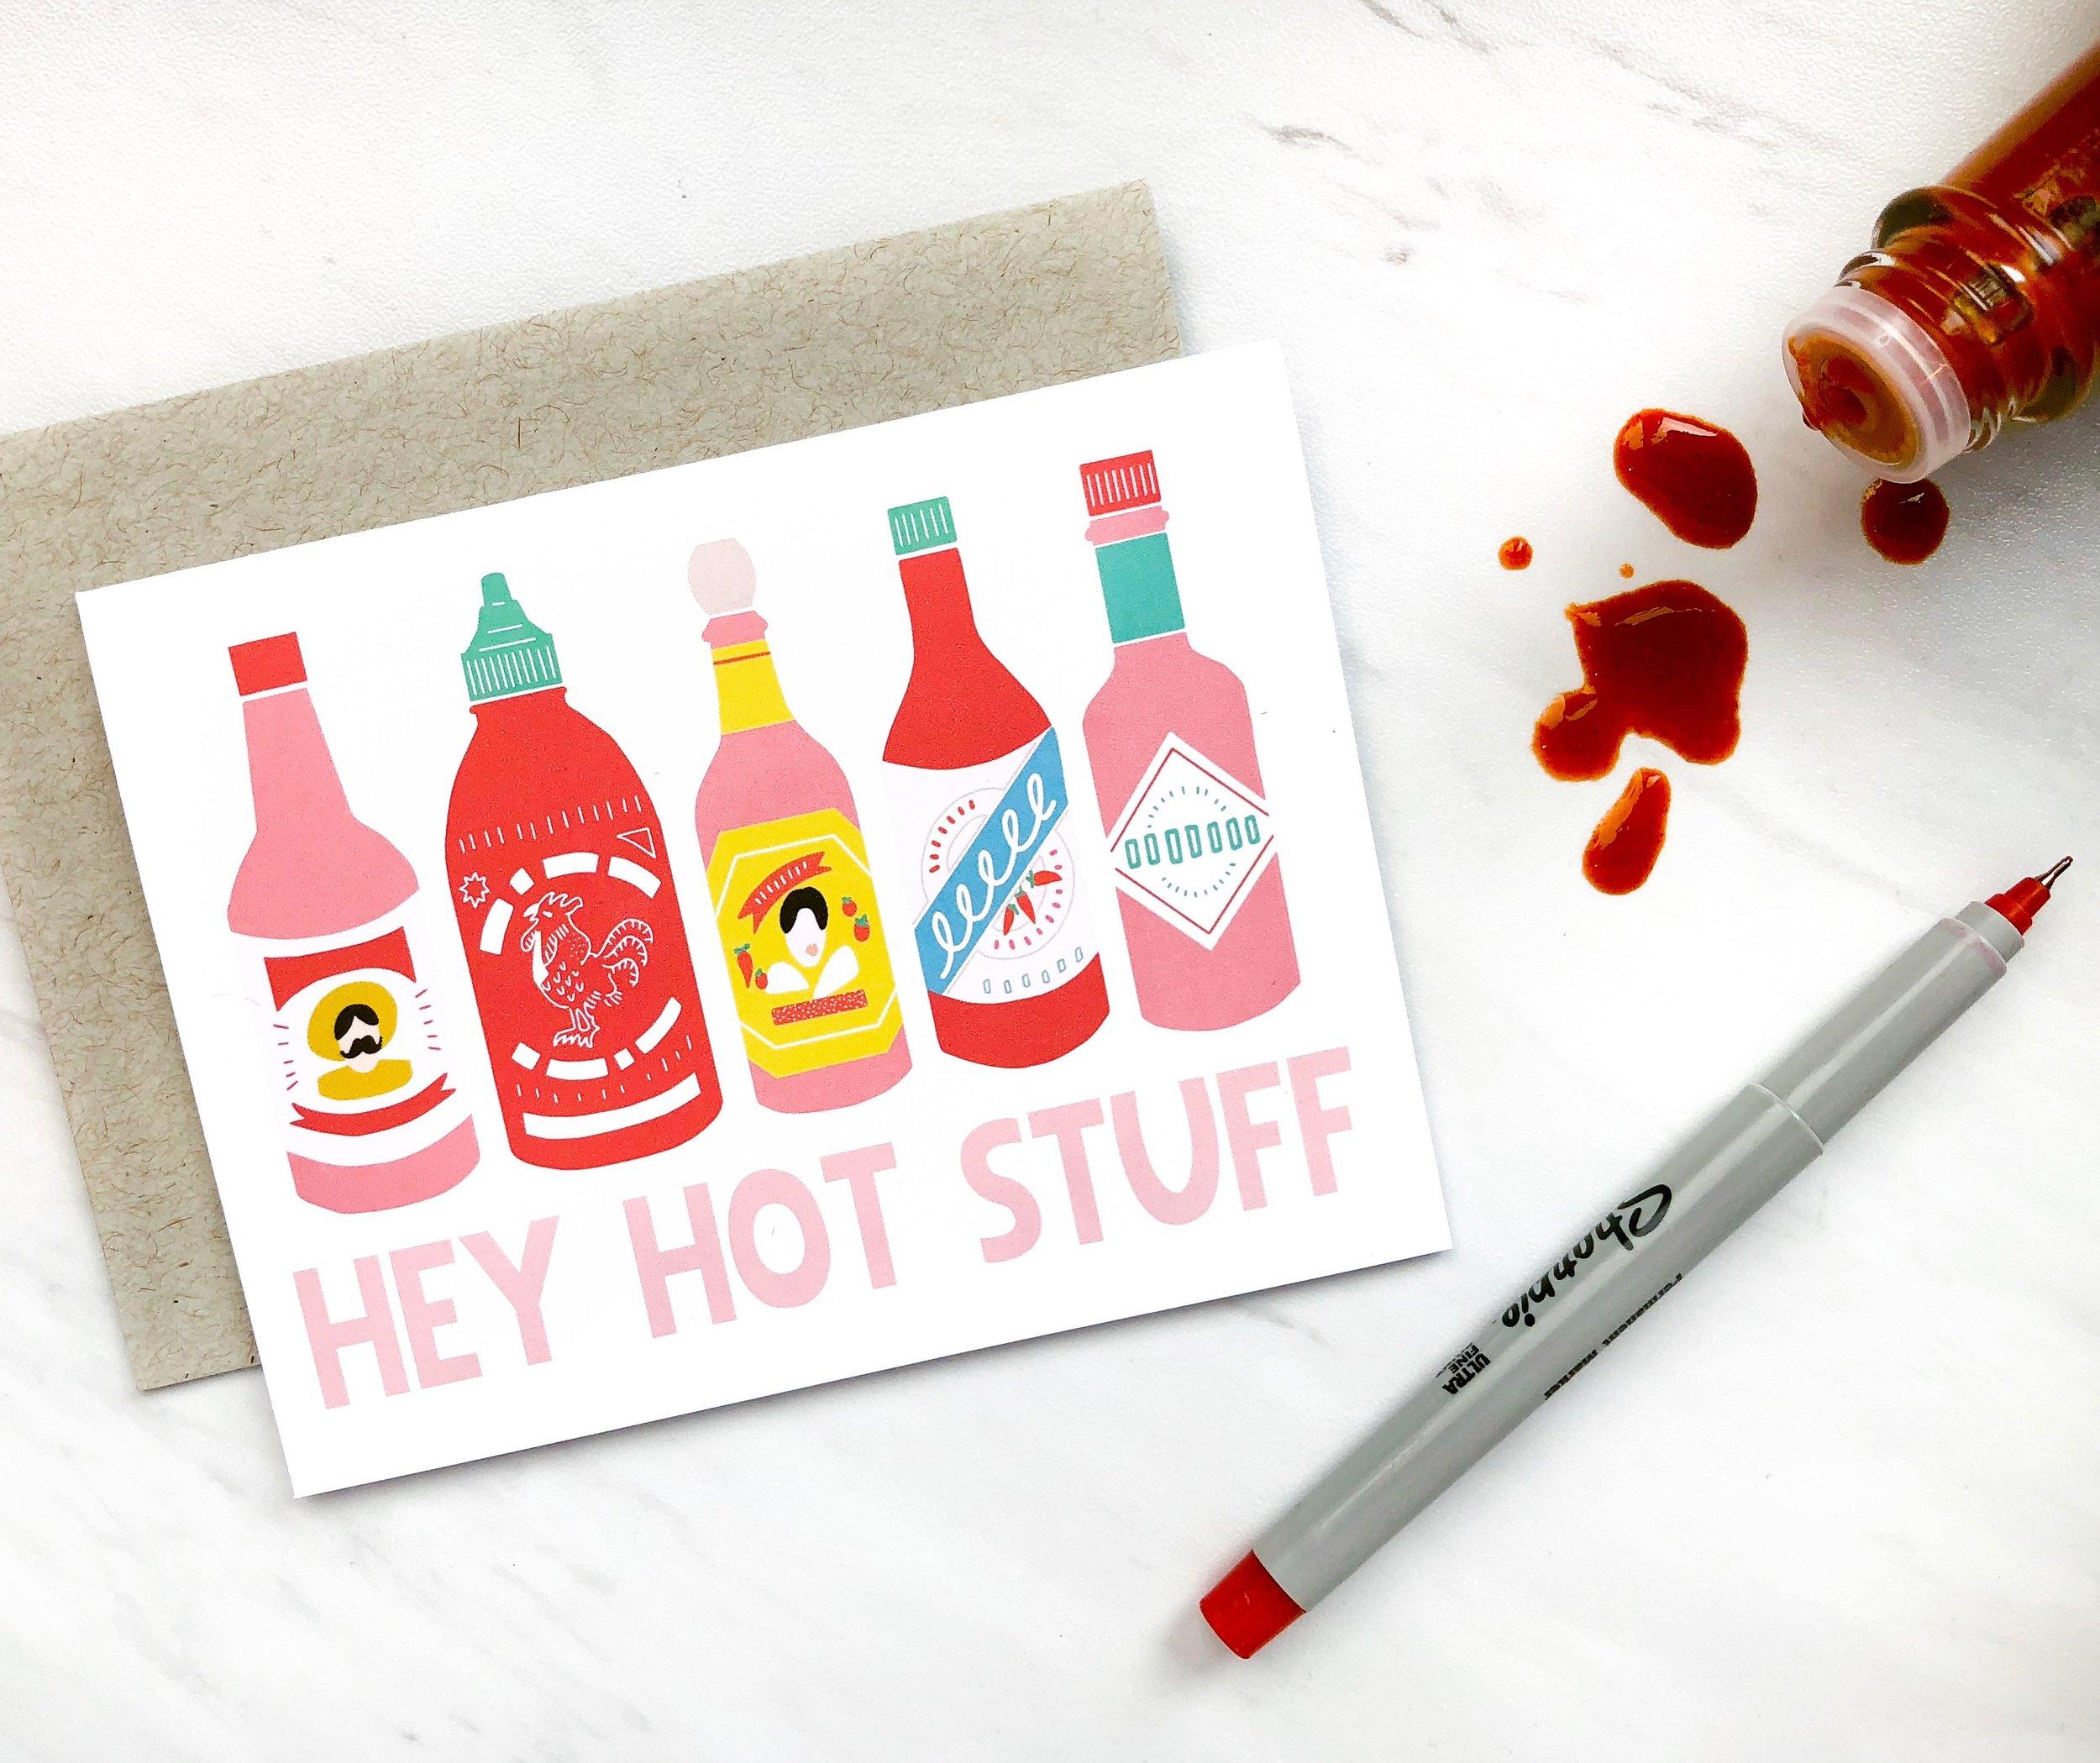 Hey Hot Stuff Card Product Shot.JPG